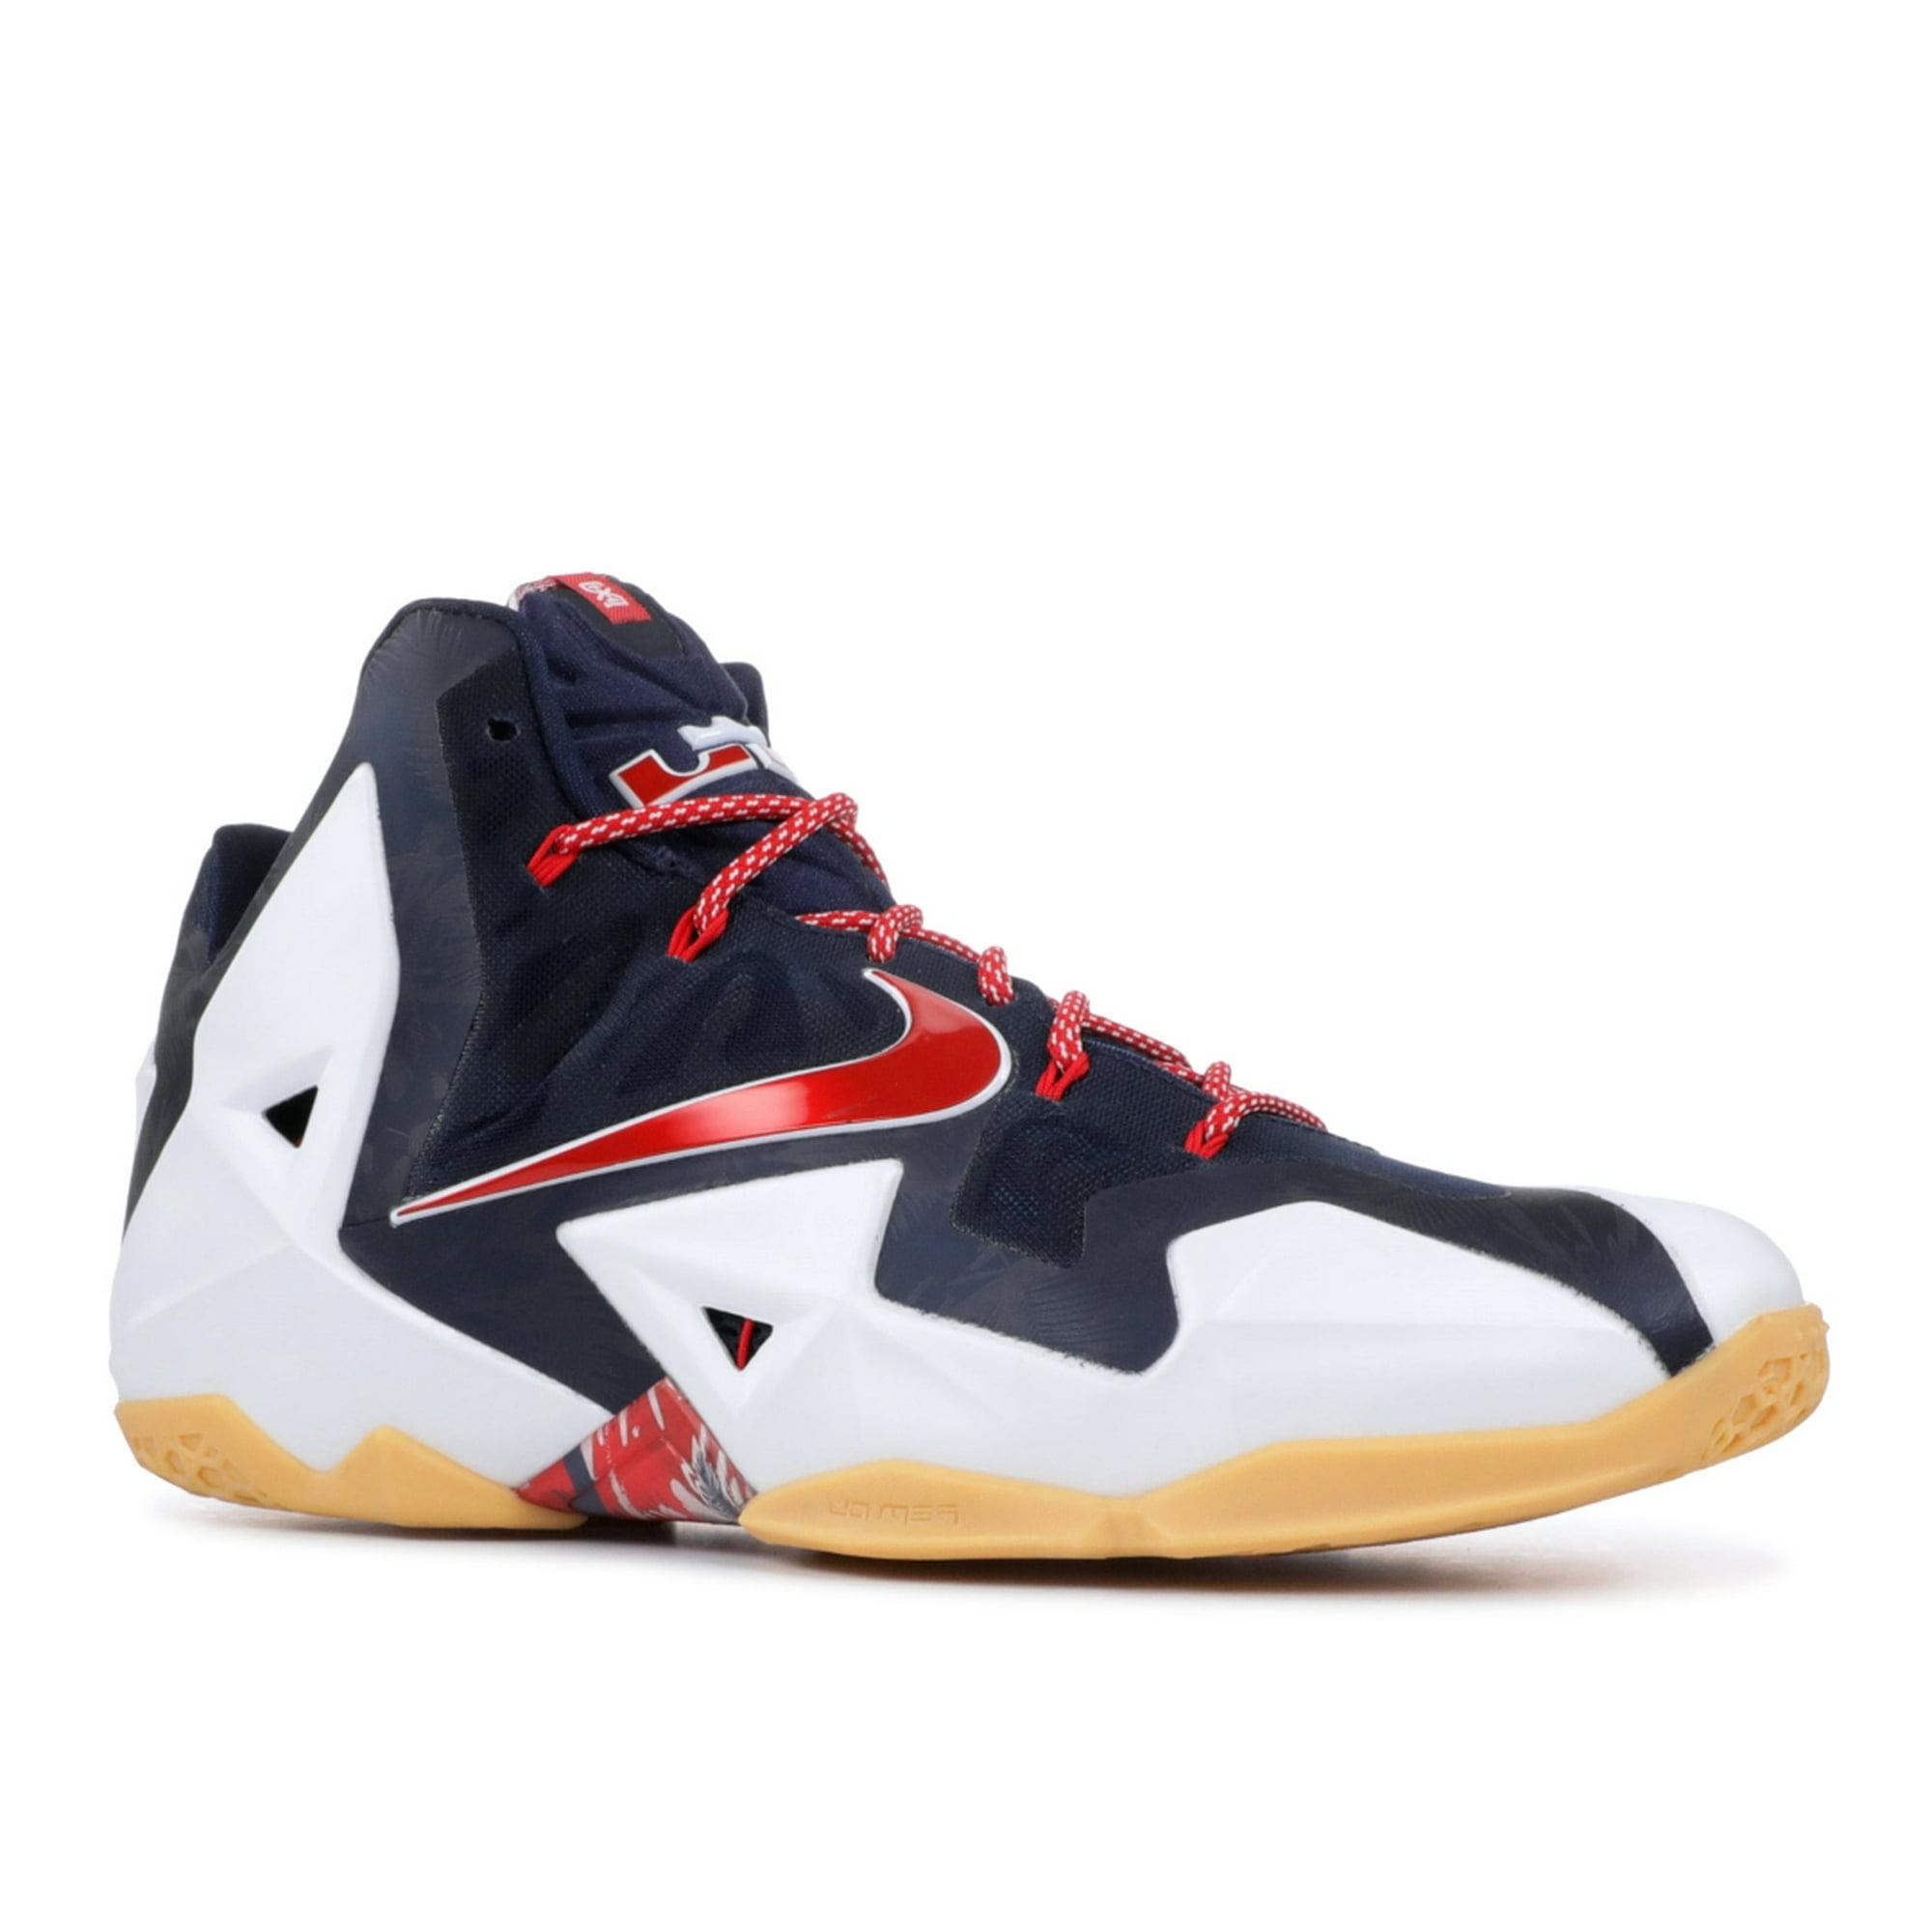 406602153604 Nike - Men - Lebron 11  Independence Day  - 616175-164 - Size 10 ...